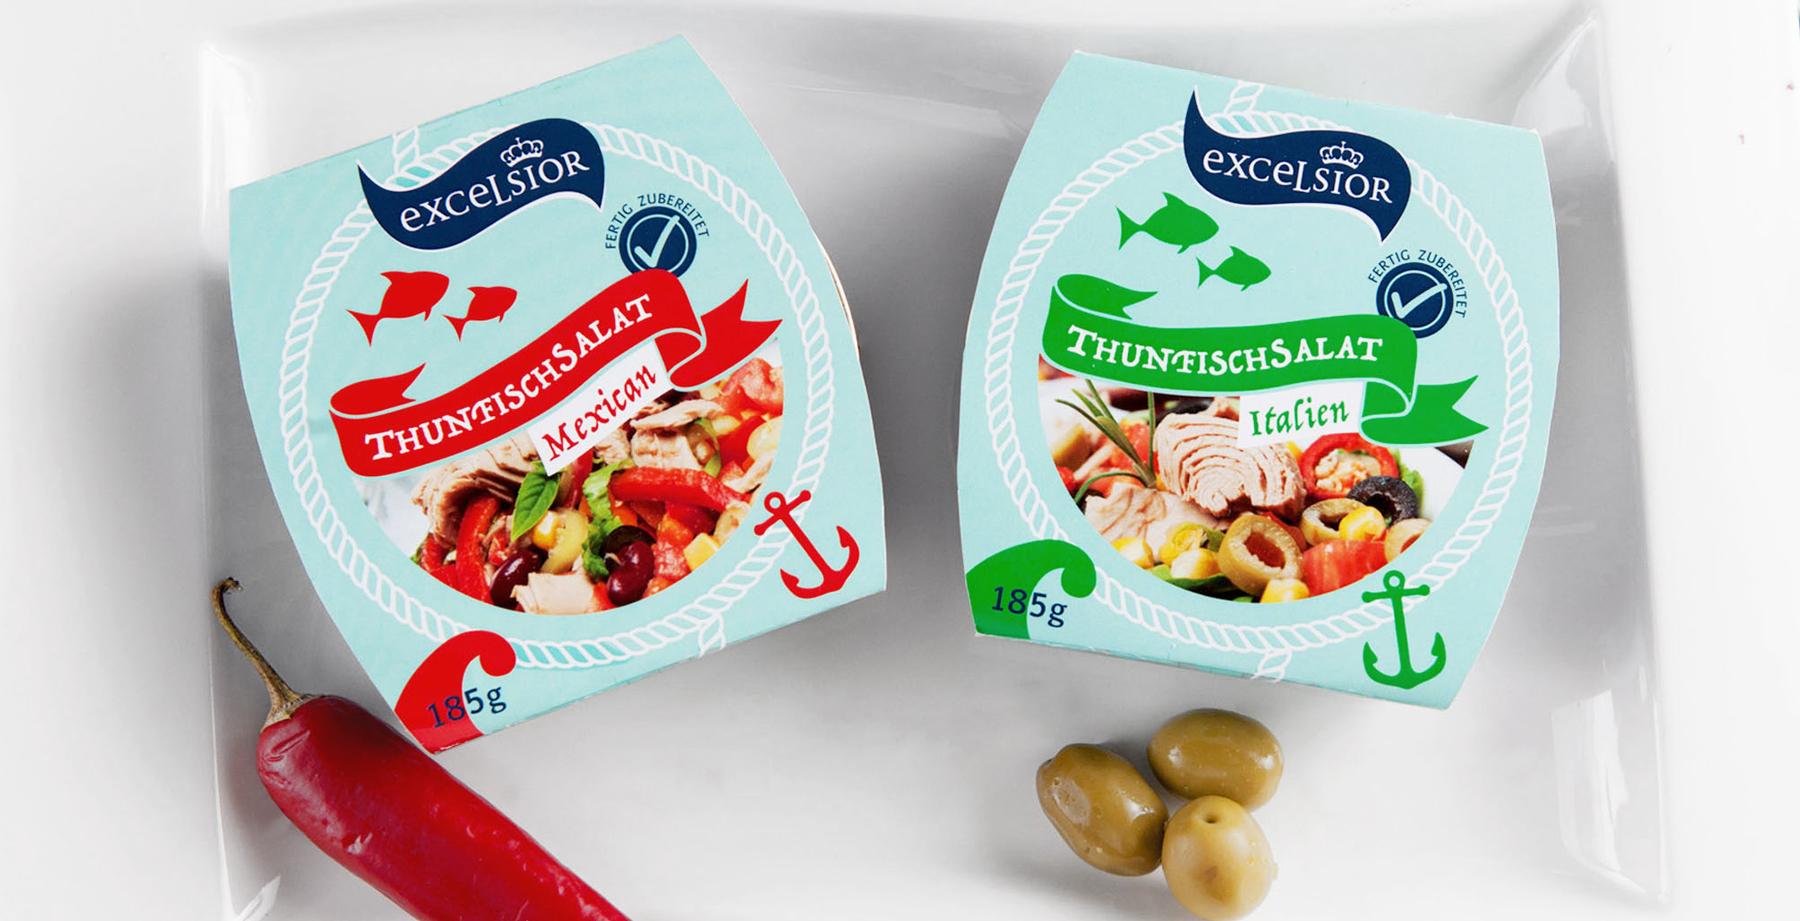 Excelsior_AmysAtelier_Brand_Food_Packaging_Design_Vienna.jpg